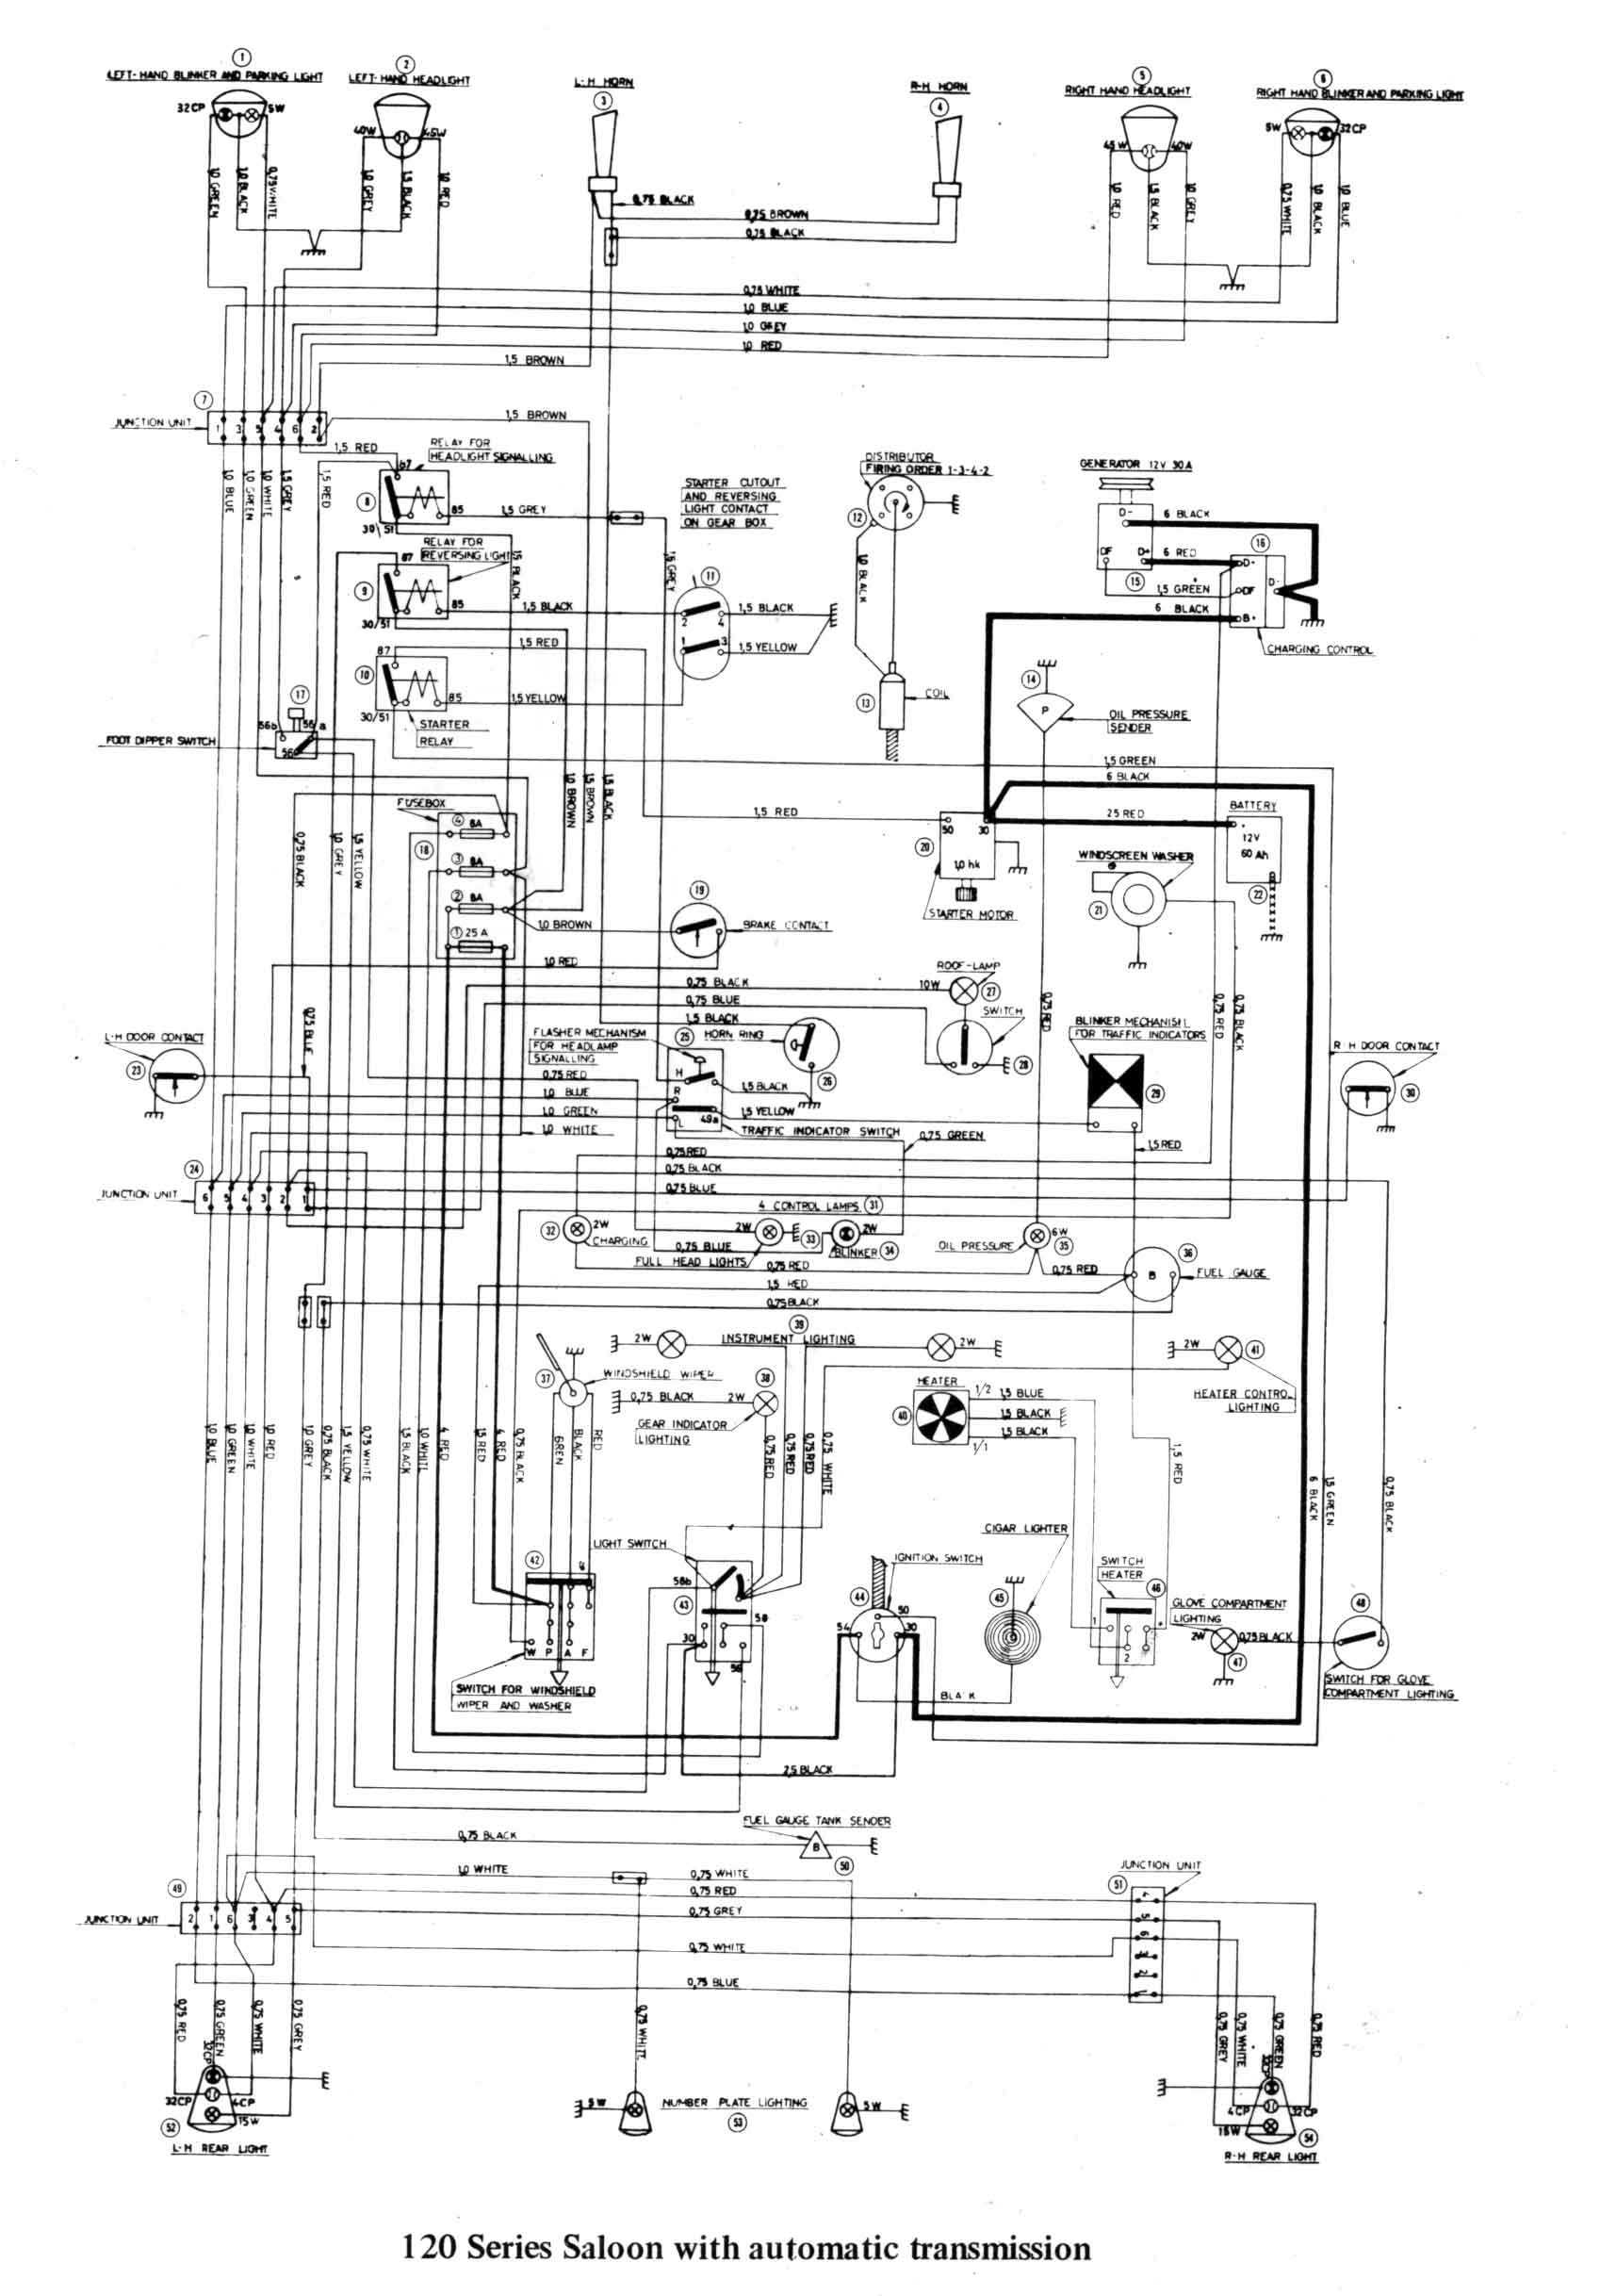 volvo xc90 abs wiring diagram betty crocker easter bunny cake 2006 nissan altima headlight best library todays rh 2 5 8 1813weddingbarn com 2004